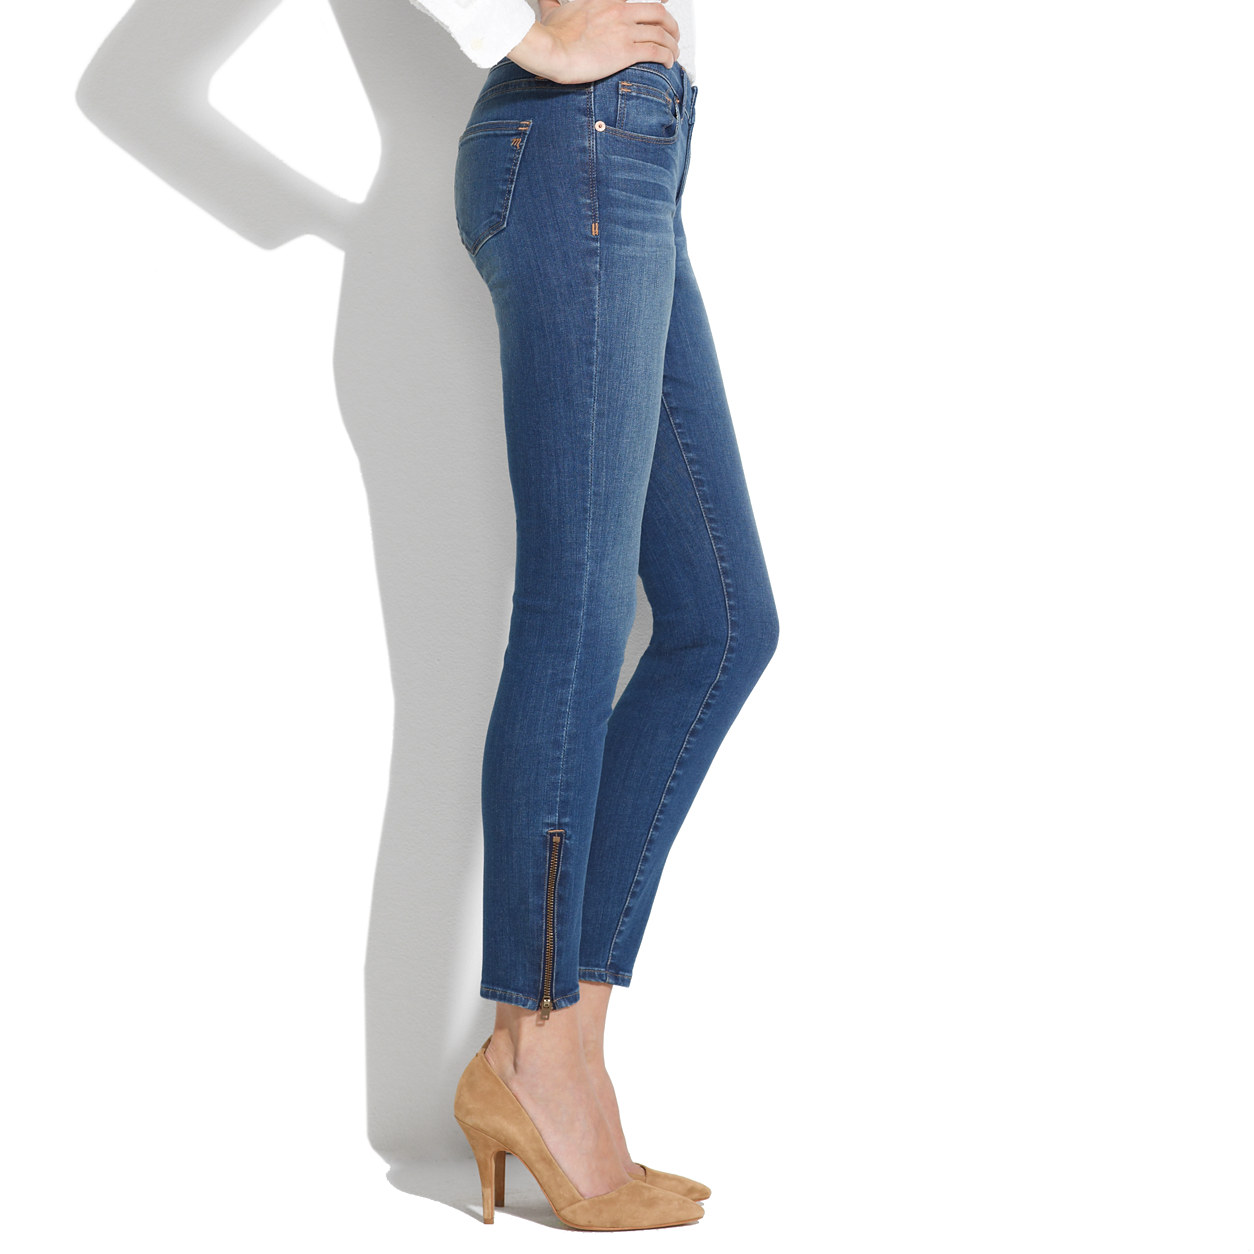 Skinny Skinny Zip Jeans in Sky Wash : skinny jeans | Madewell